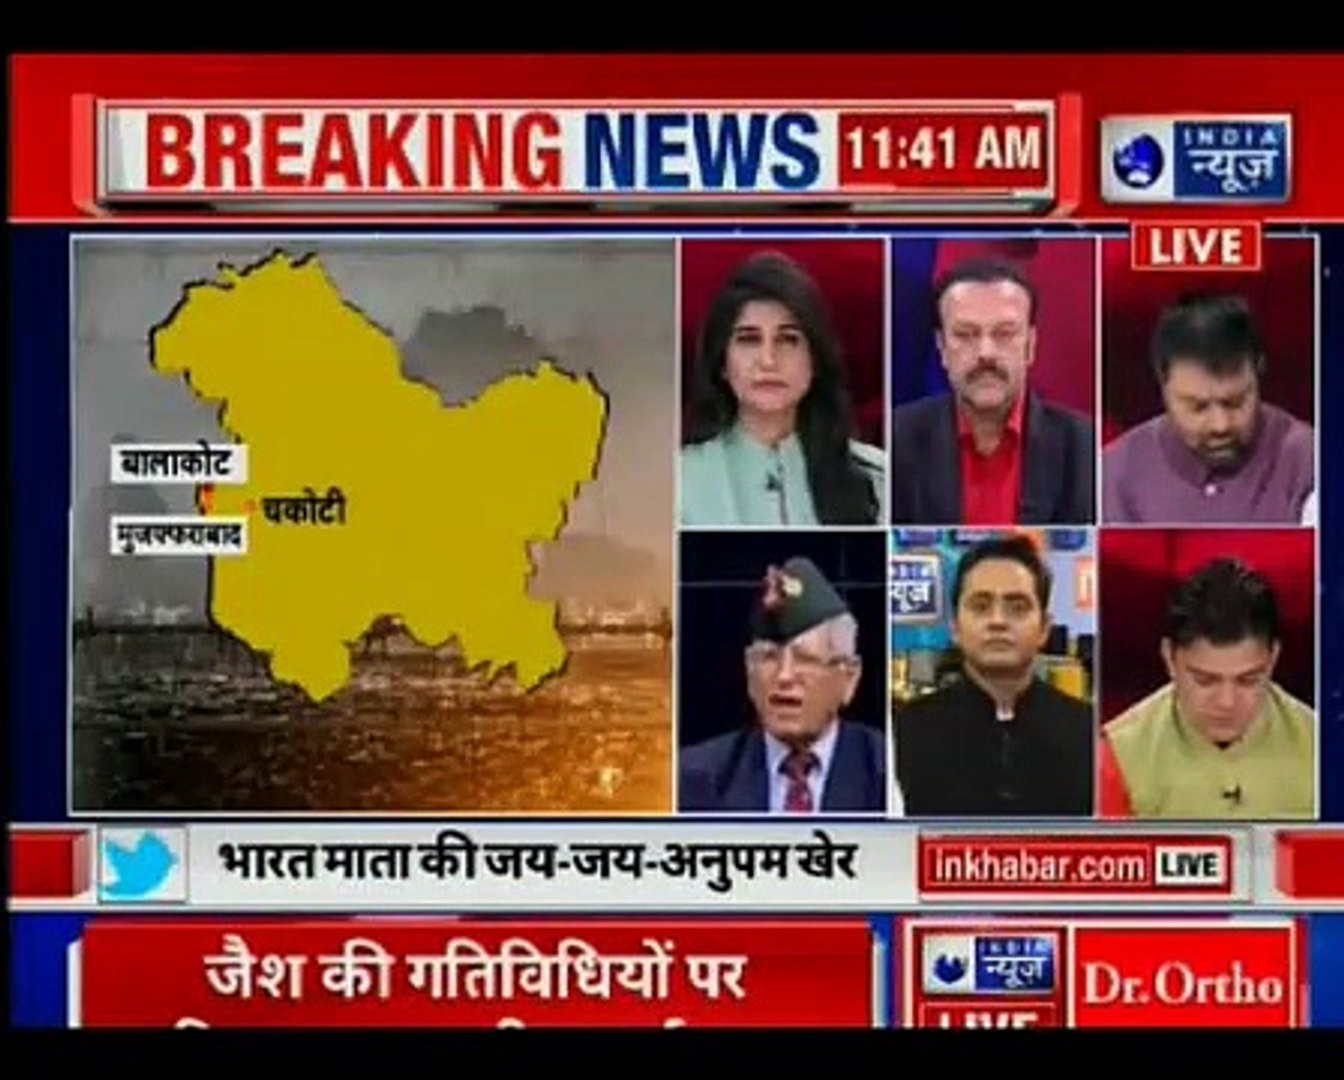 Indian Air Force Strikes Pakistan in Balakot Sector on JeM Camp एयर स्ट्राइक बाल